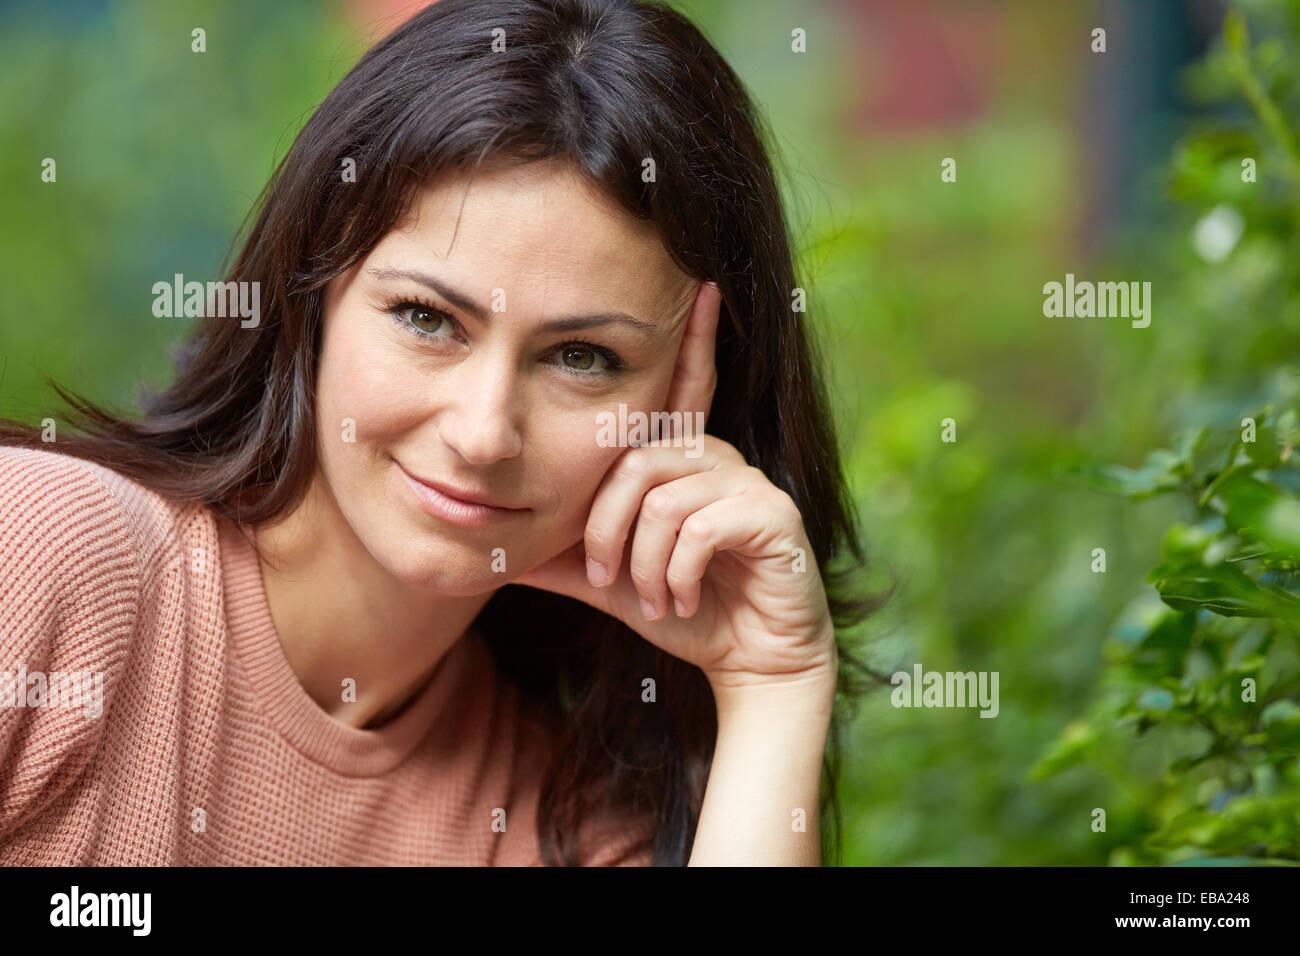 35 year old woman in a park. Donostia. San Sebastian. Gipuzkoa. Basque Country, Spain. - Stock Image